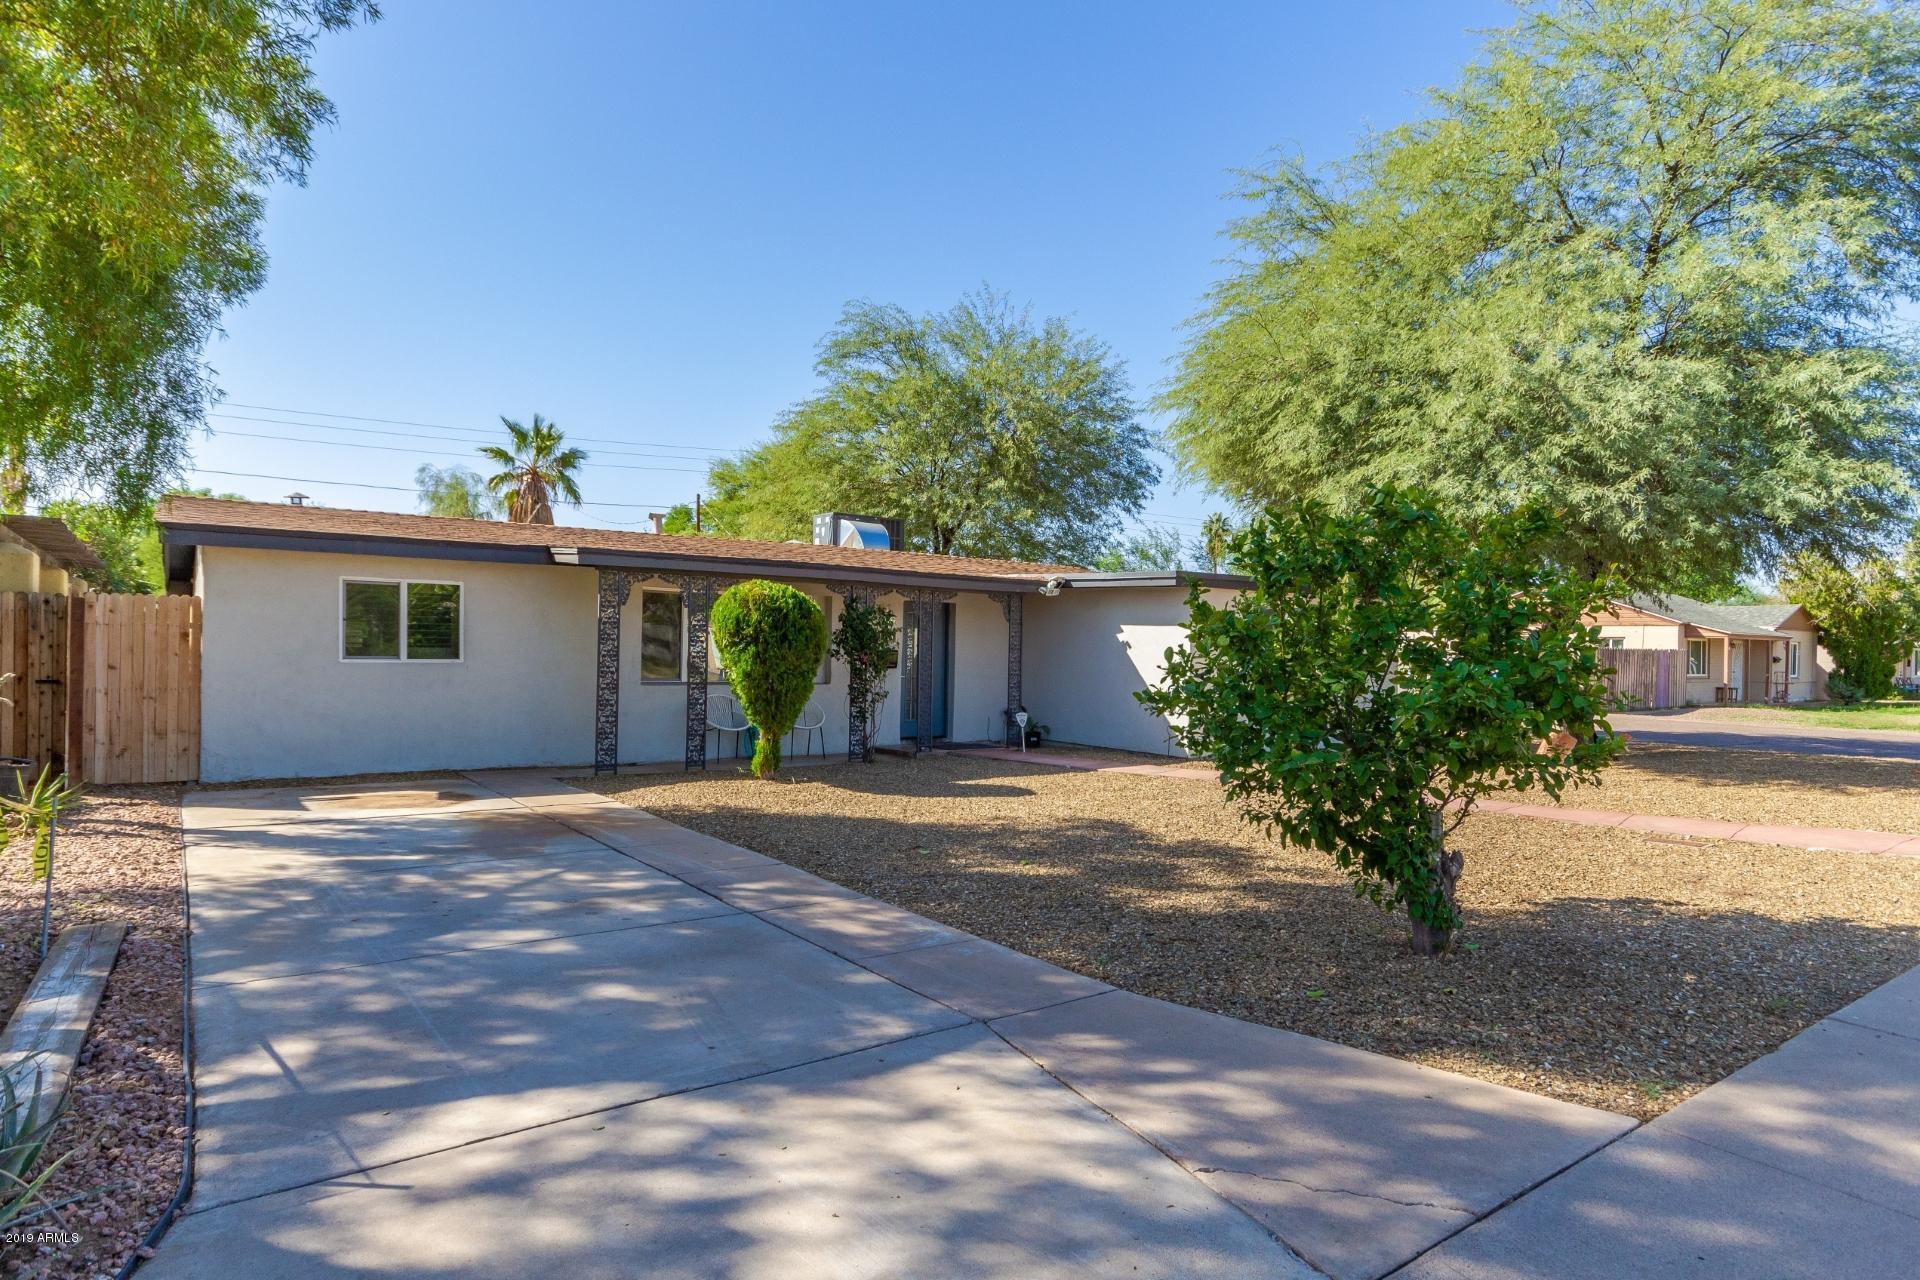 Photo of 1545 W ROMA Avenue, Phoenix, AZ 85015